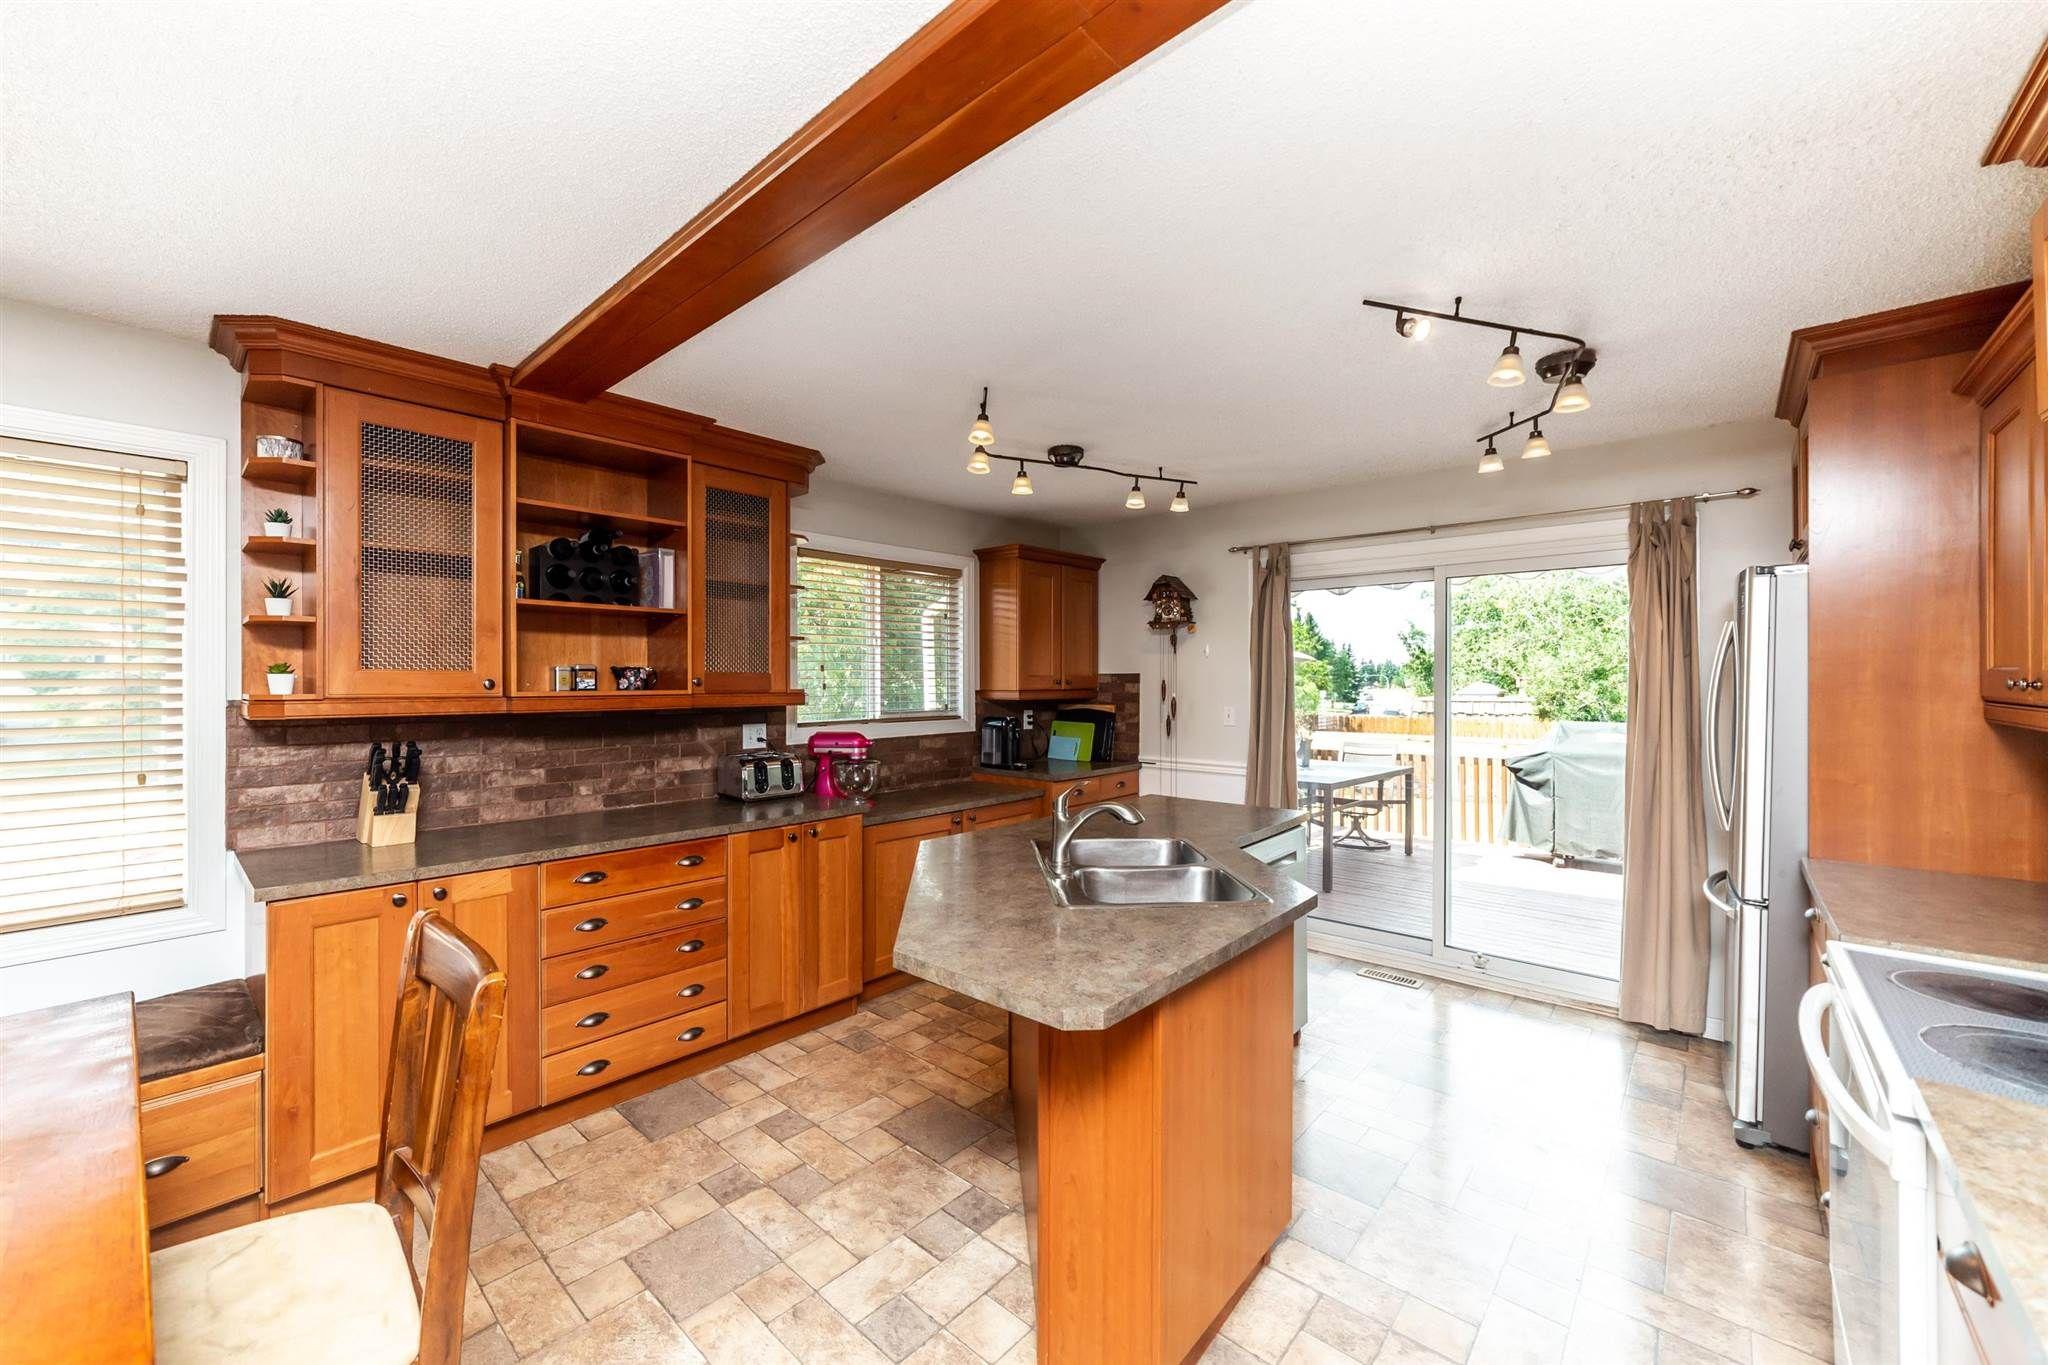 Main Photo: 1703 48 Street in Edmonton: Zone 29 House for sale : MLS®# E4253863